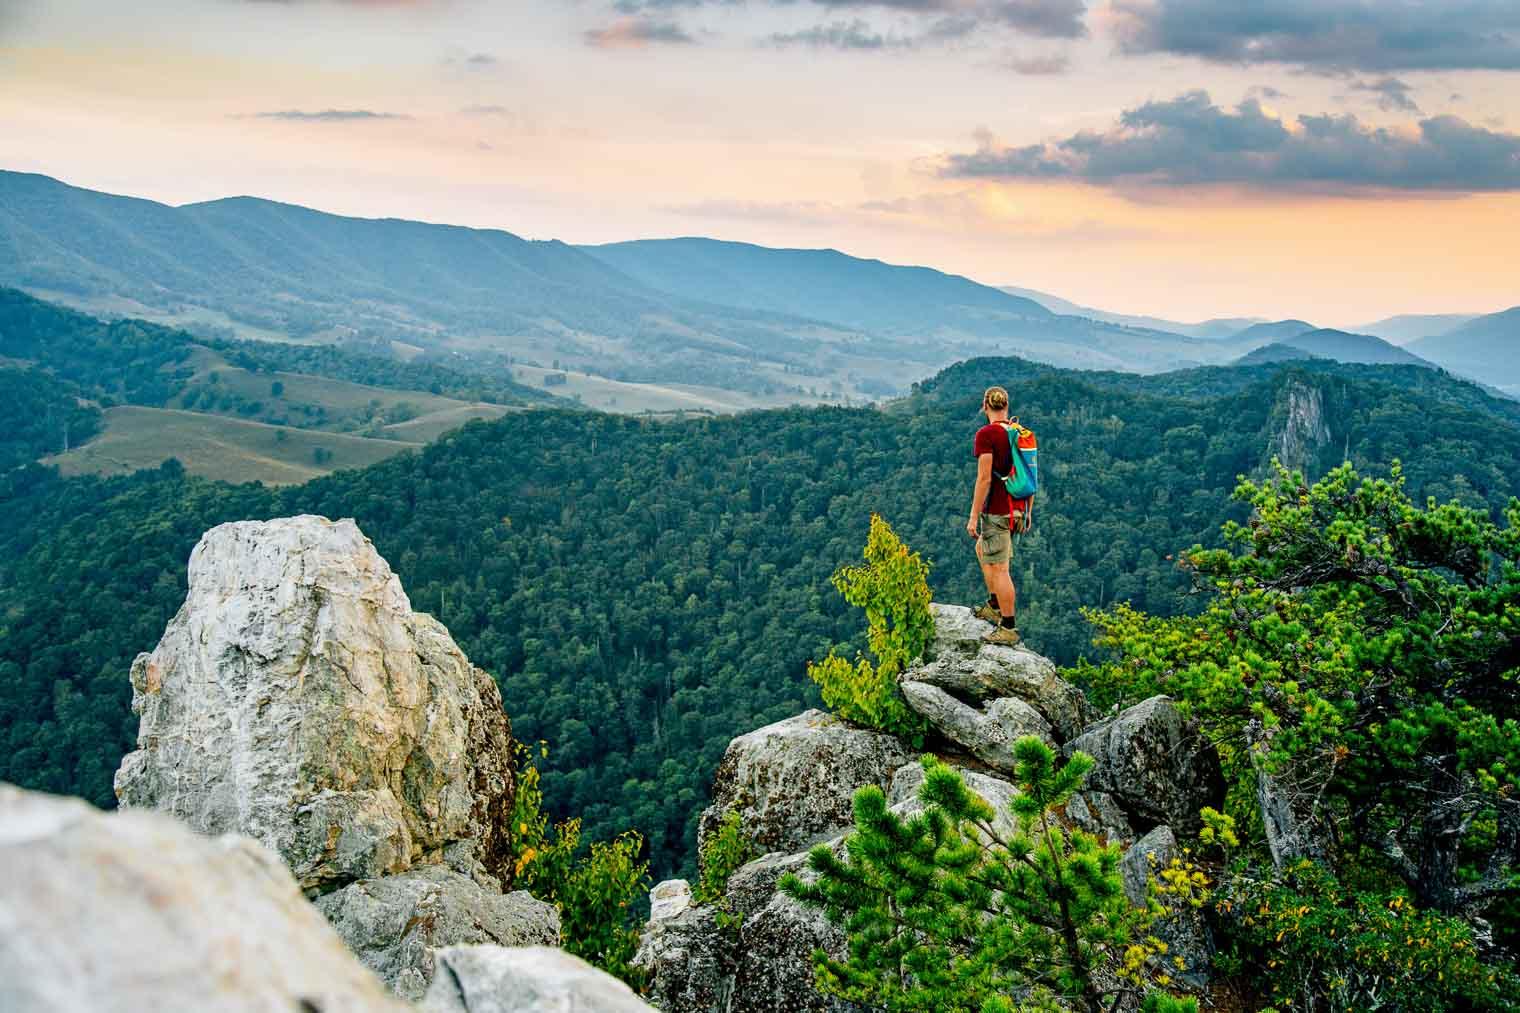 Wild, Wonderful West Virginia: Our 7 Day Road Trip Through ...